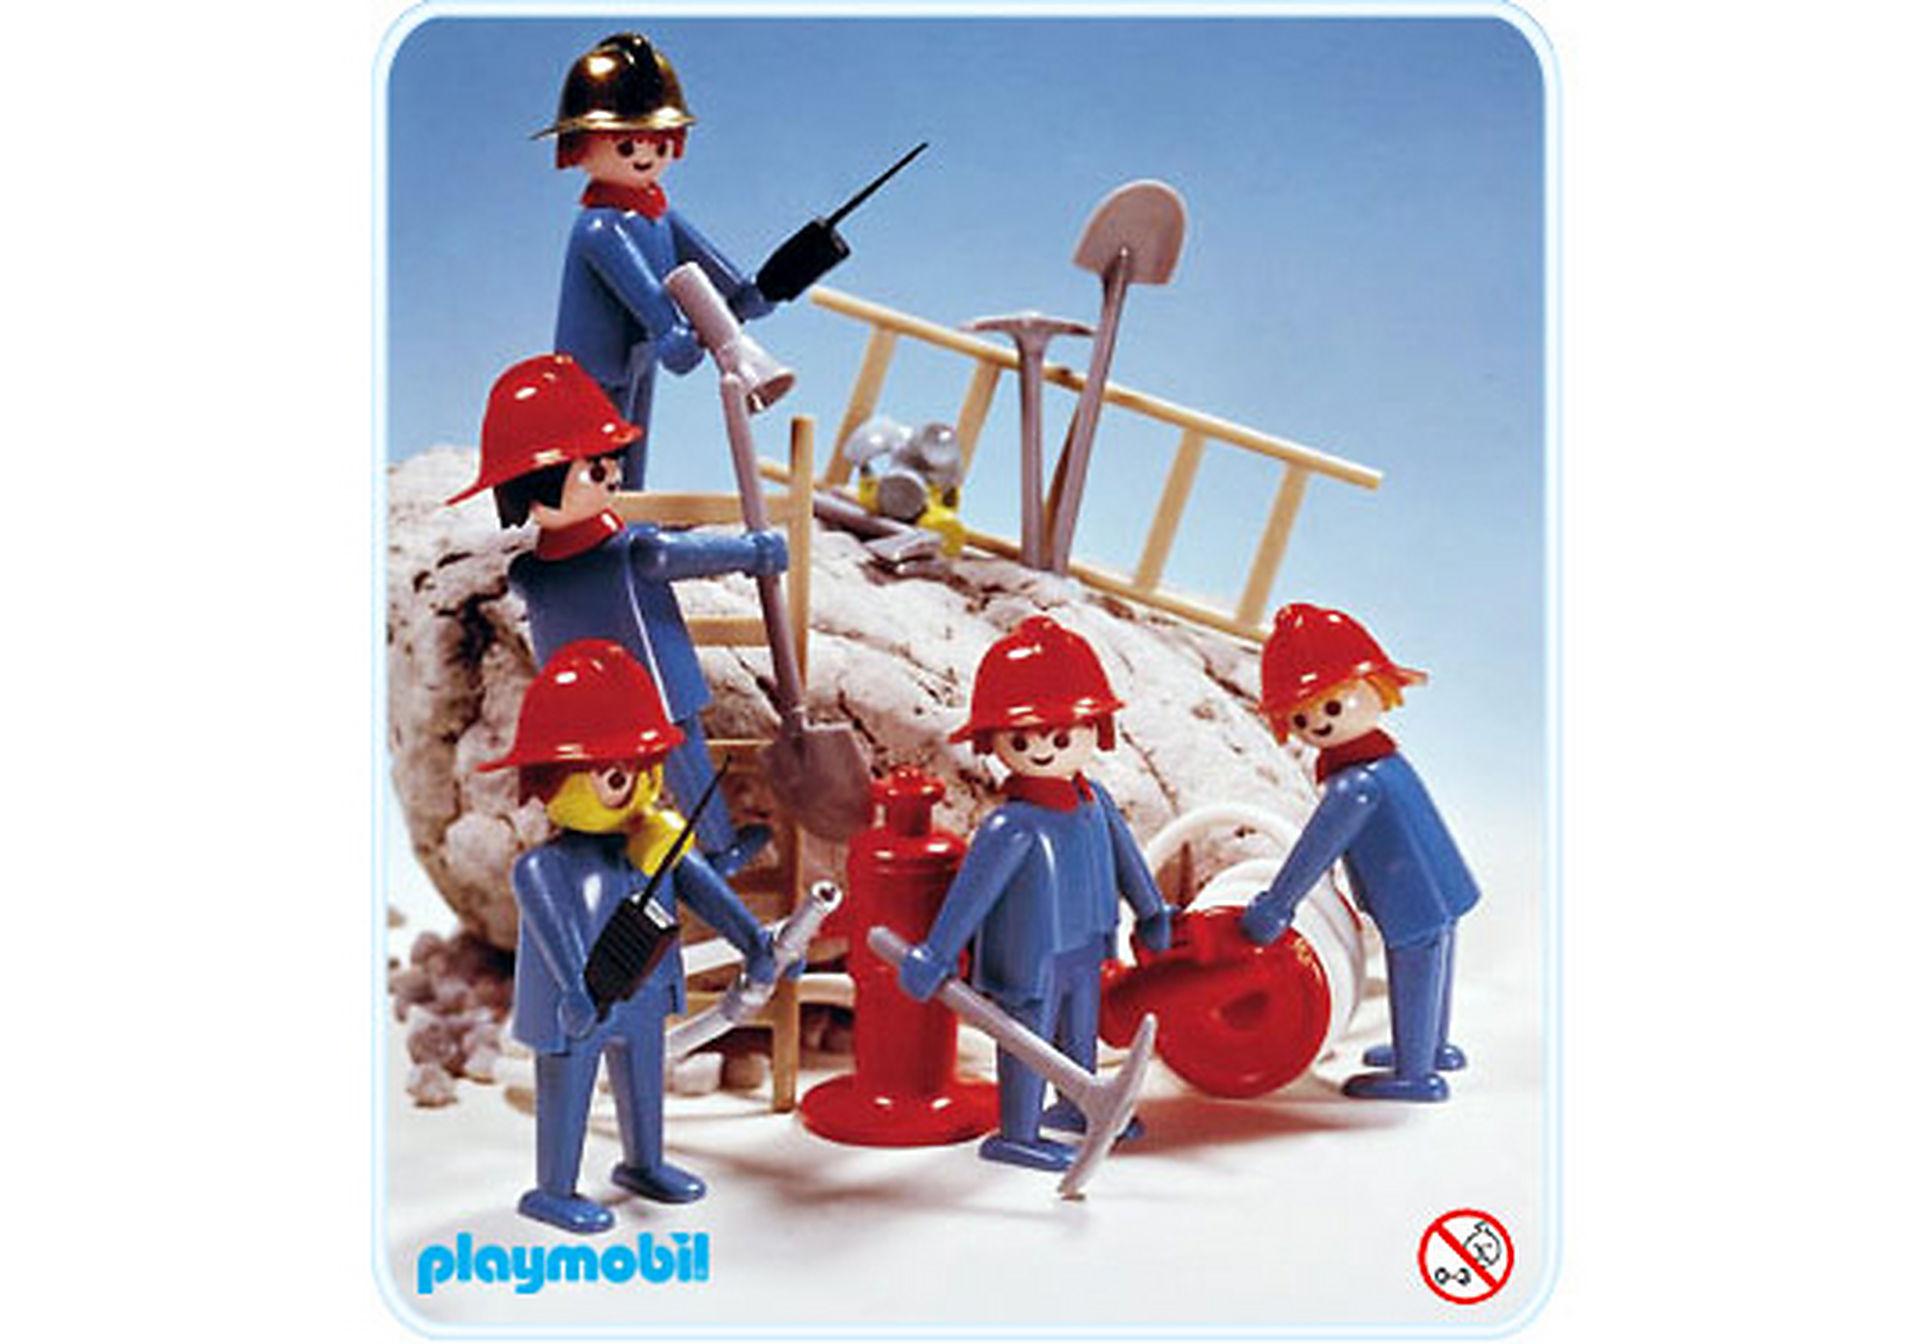 http://media.playmobil.com/i/playmobil/3234-A_product_detail/Feuerwehr - Set